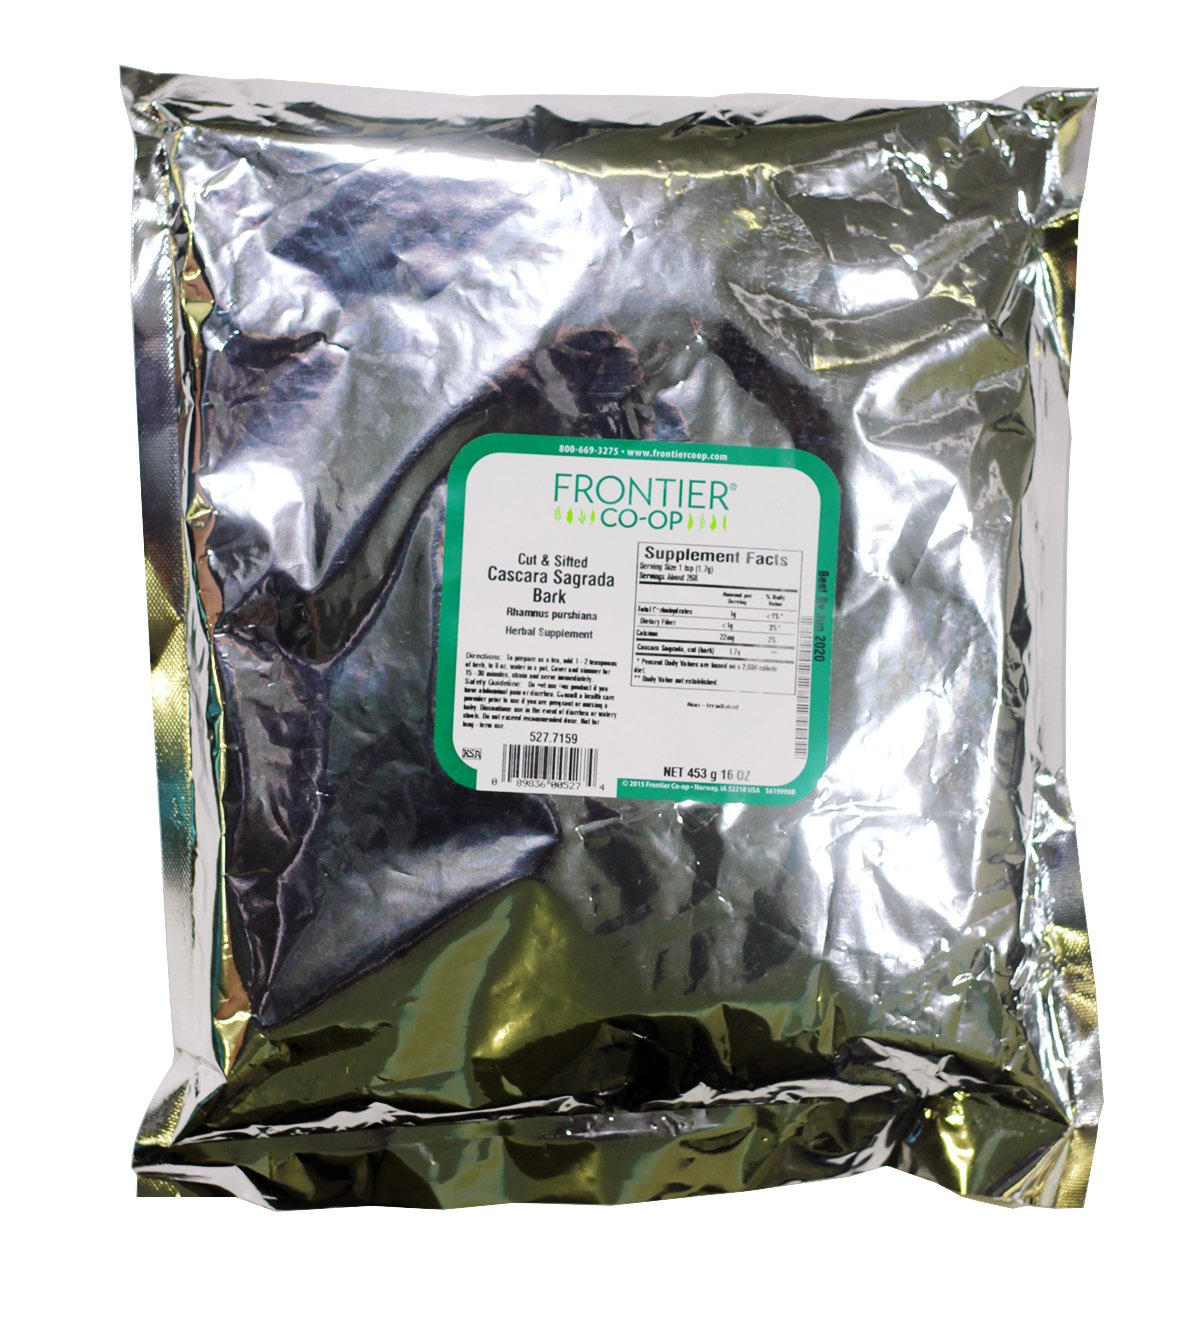 Frontier Bulk Cascara Sagrada Bark (Aged), Cut & Sifted, 1 lb. package